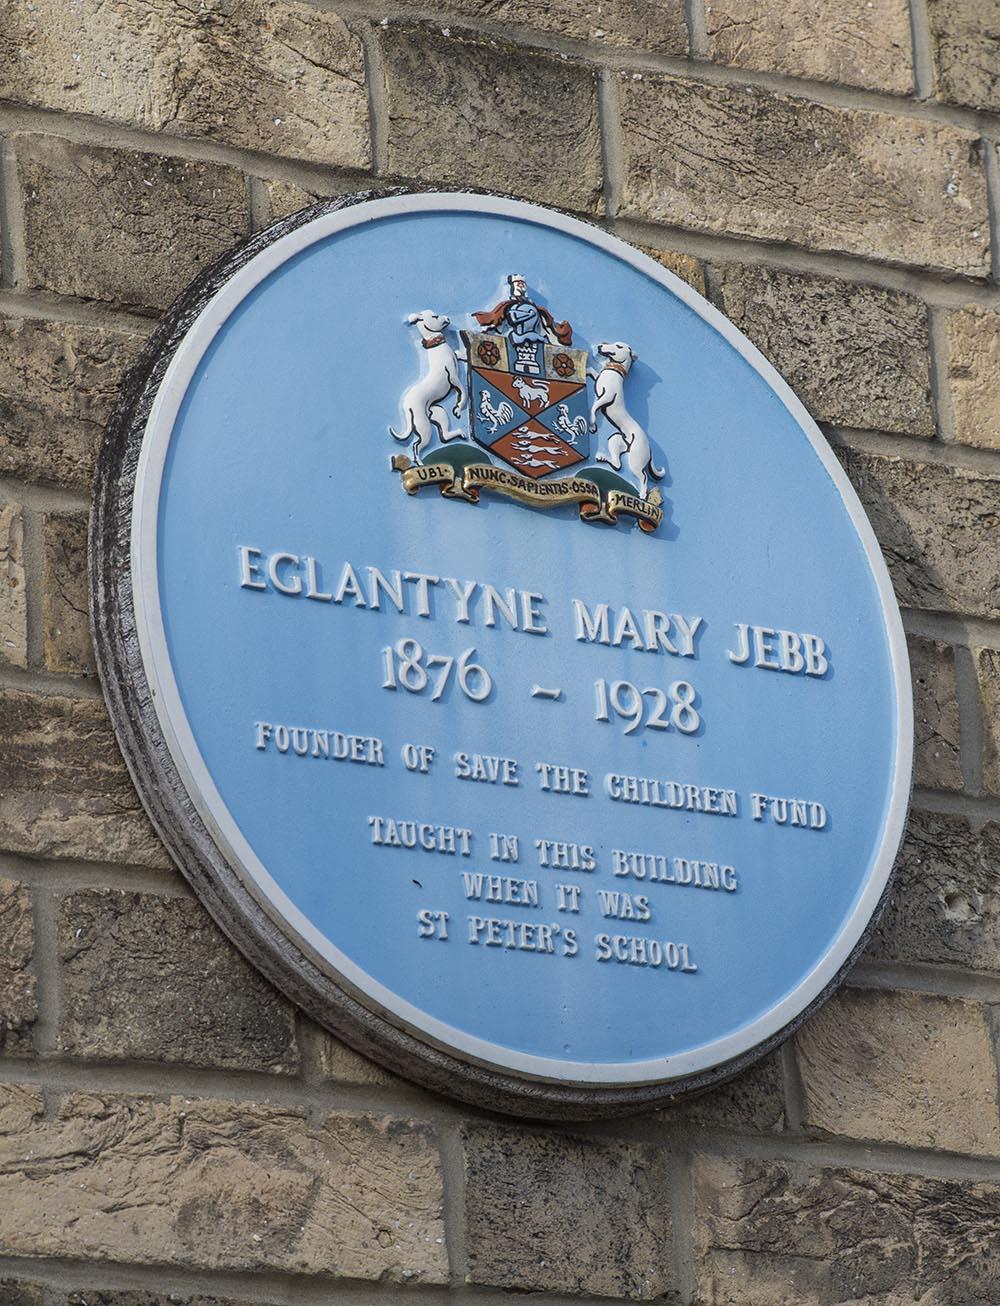 The Eglantyne Mary Jebb plaque on the wall of Marlborough's library